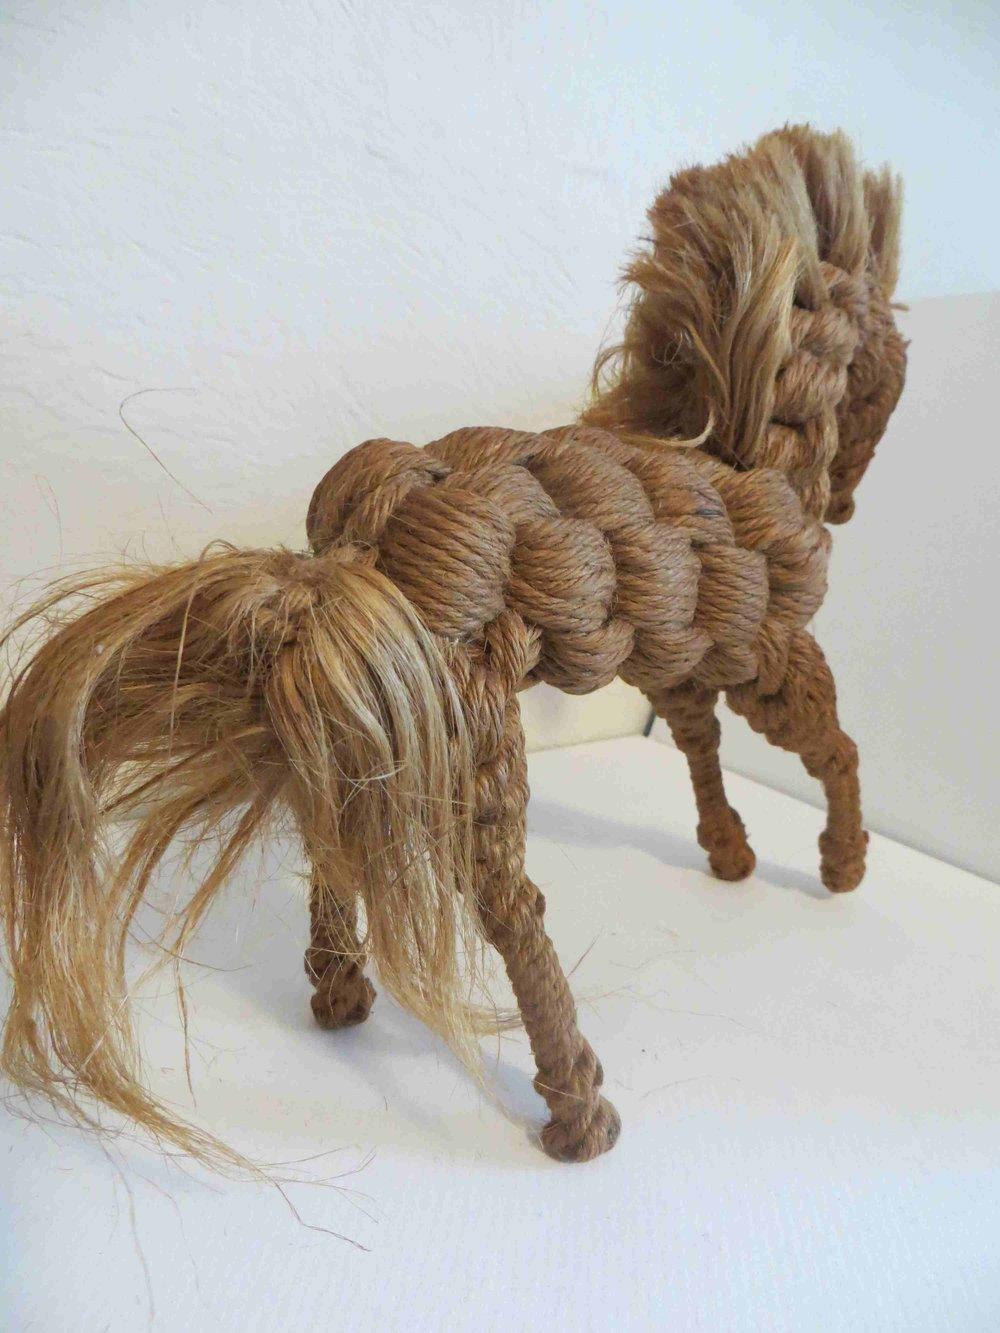 Twine Horse sculpture by Raiford FL INmate ARtist-020.jpg